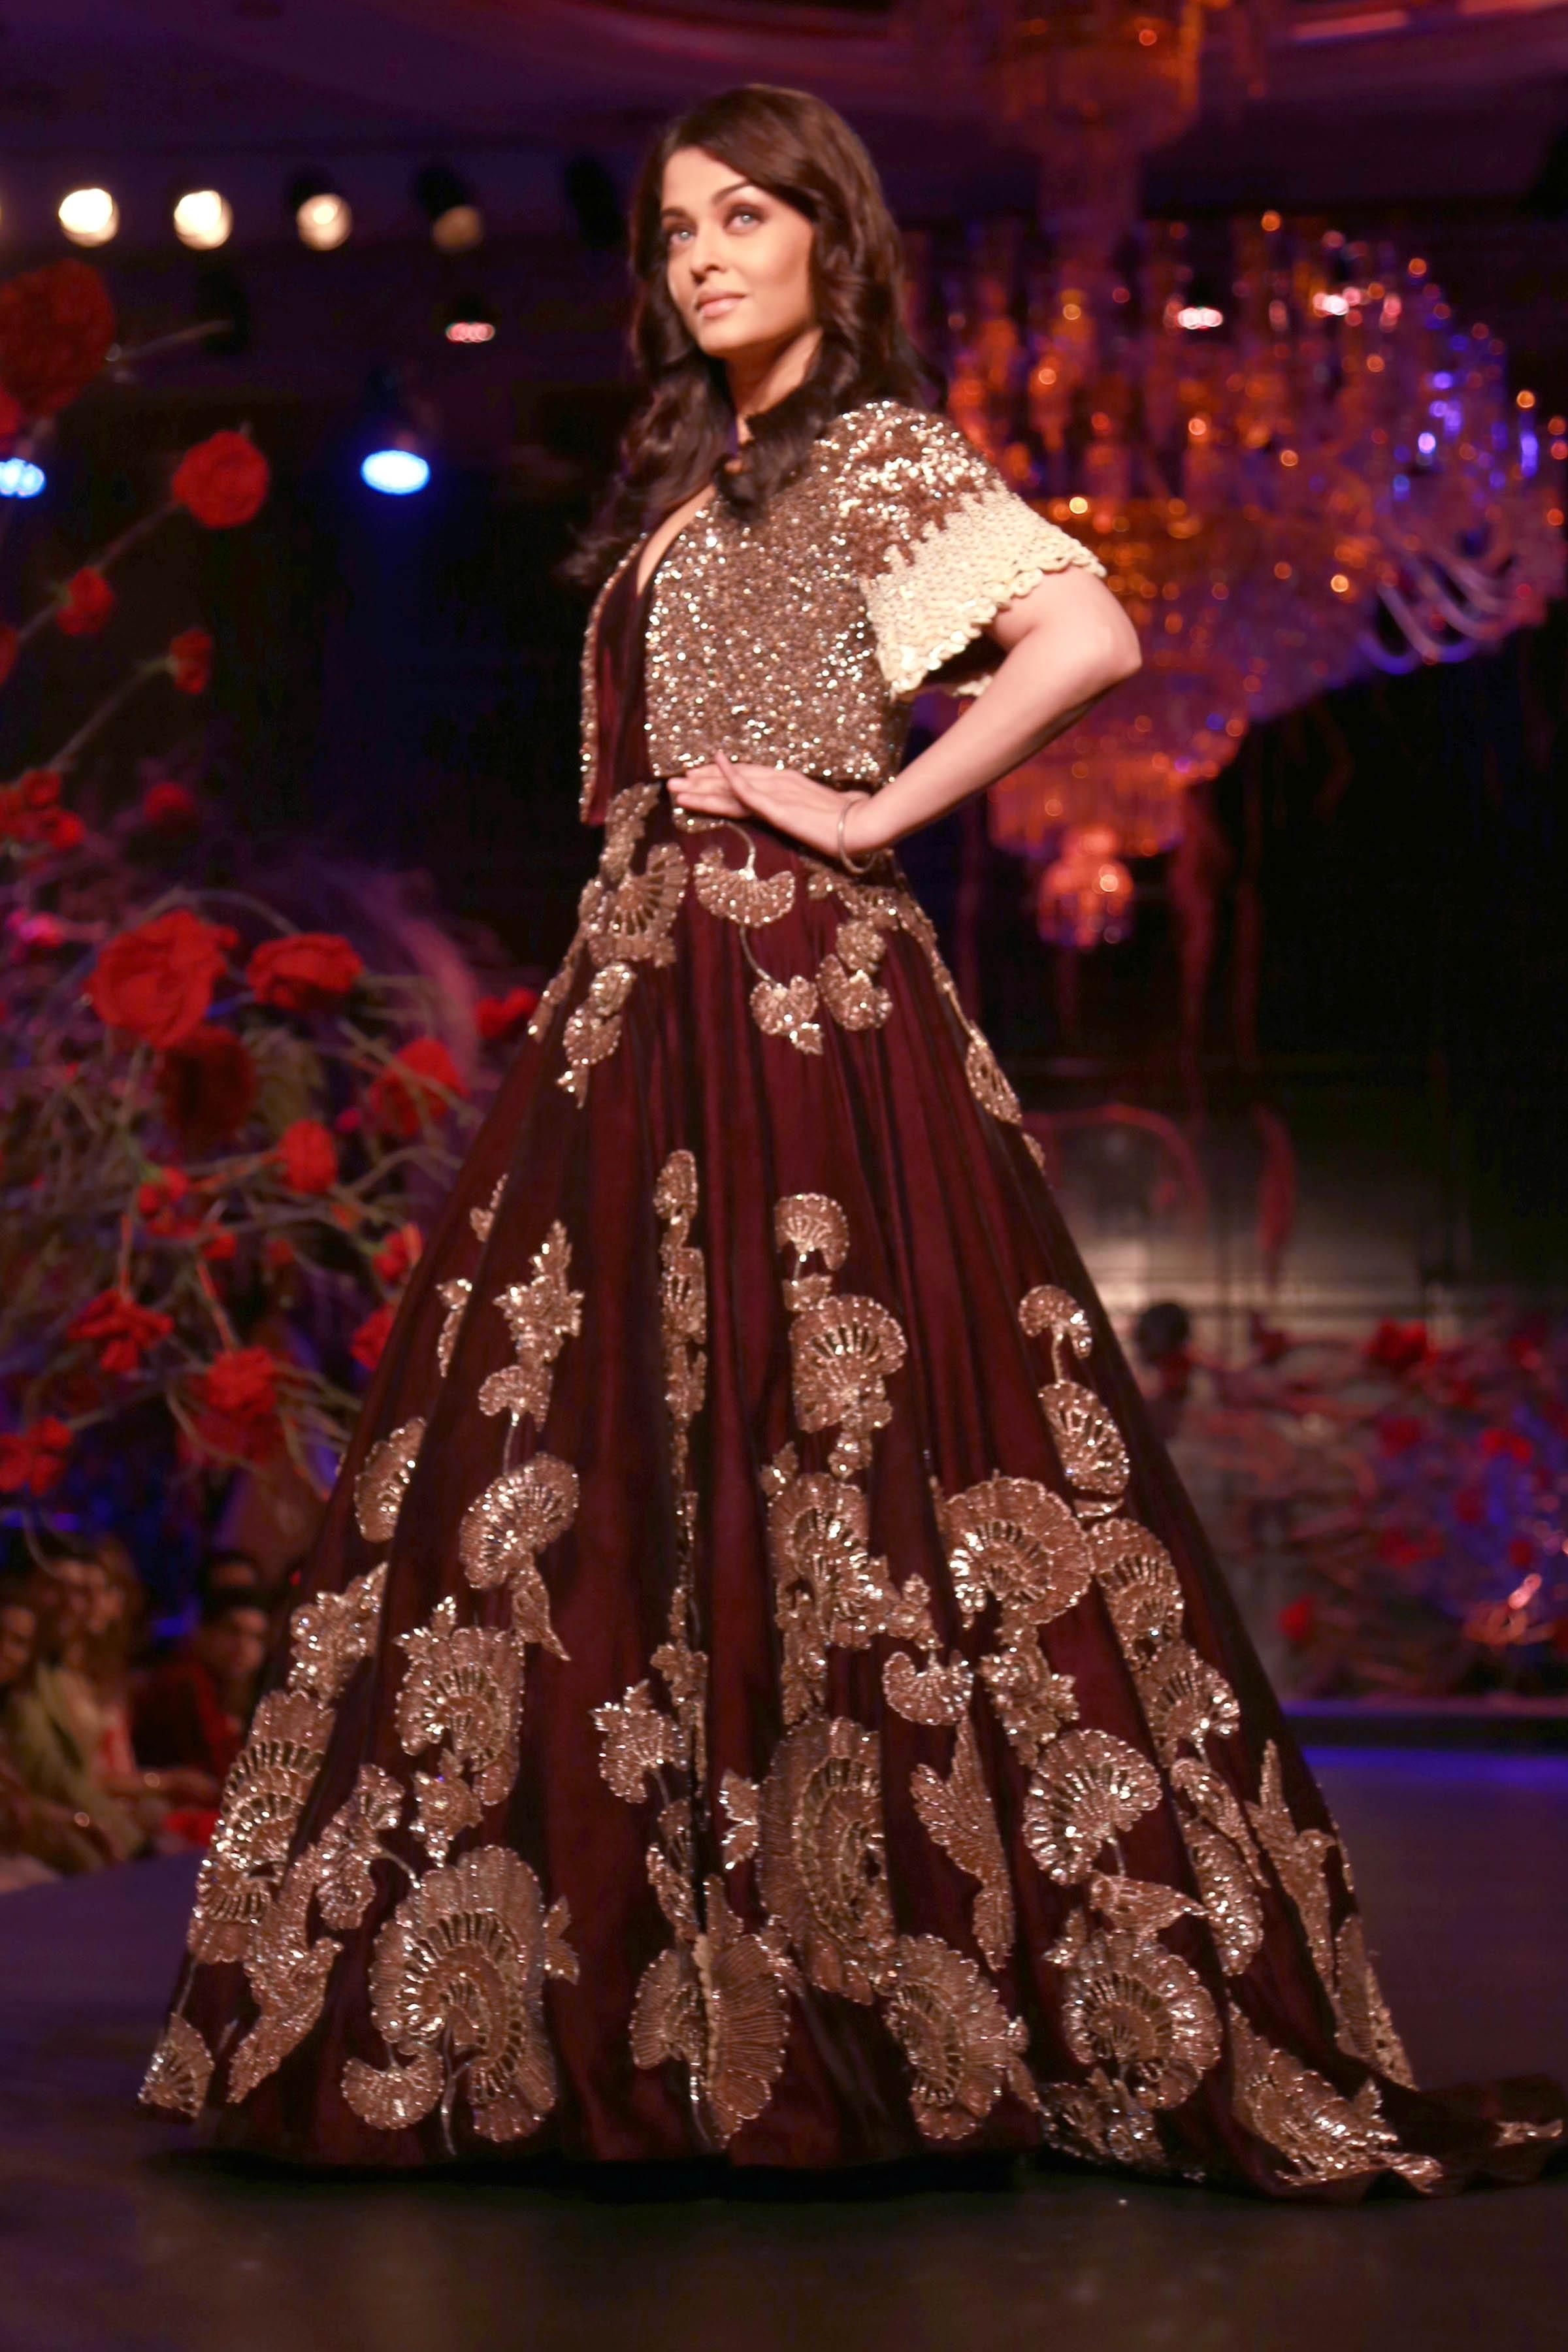 Aishwarya in Velvet lehenga by Manish Malhotra